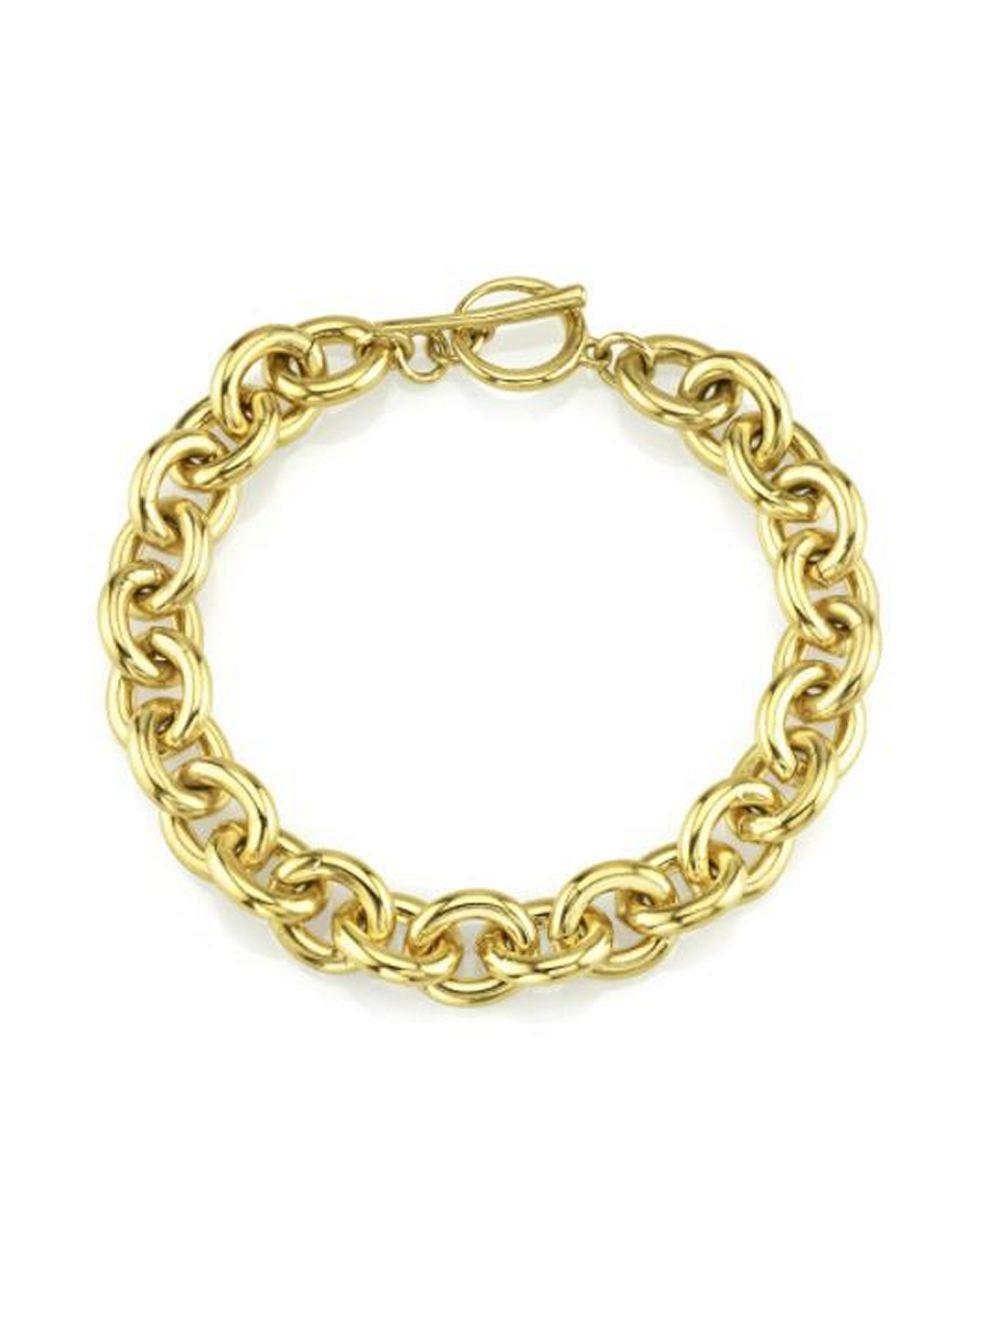 Chain Bracelet Item # BC48